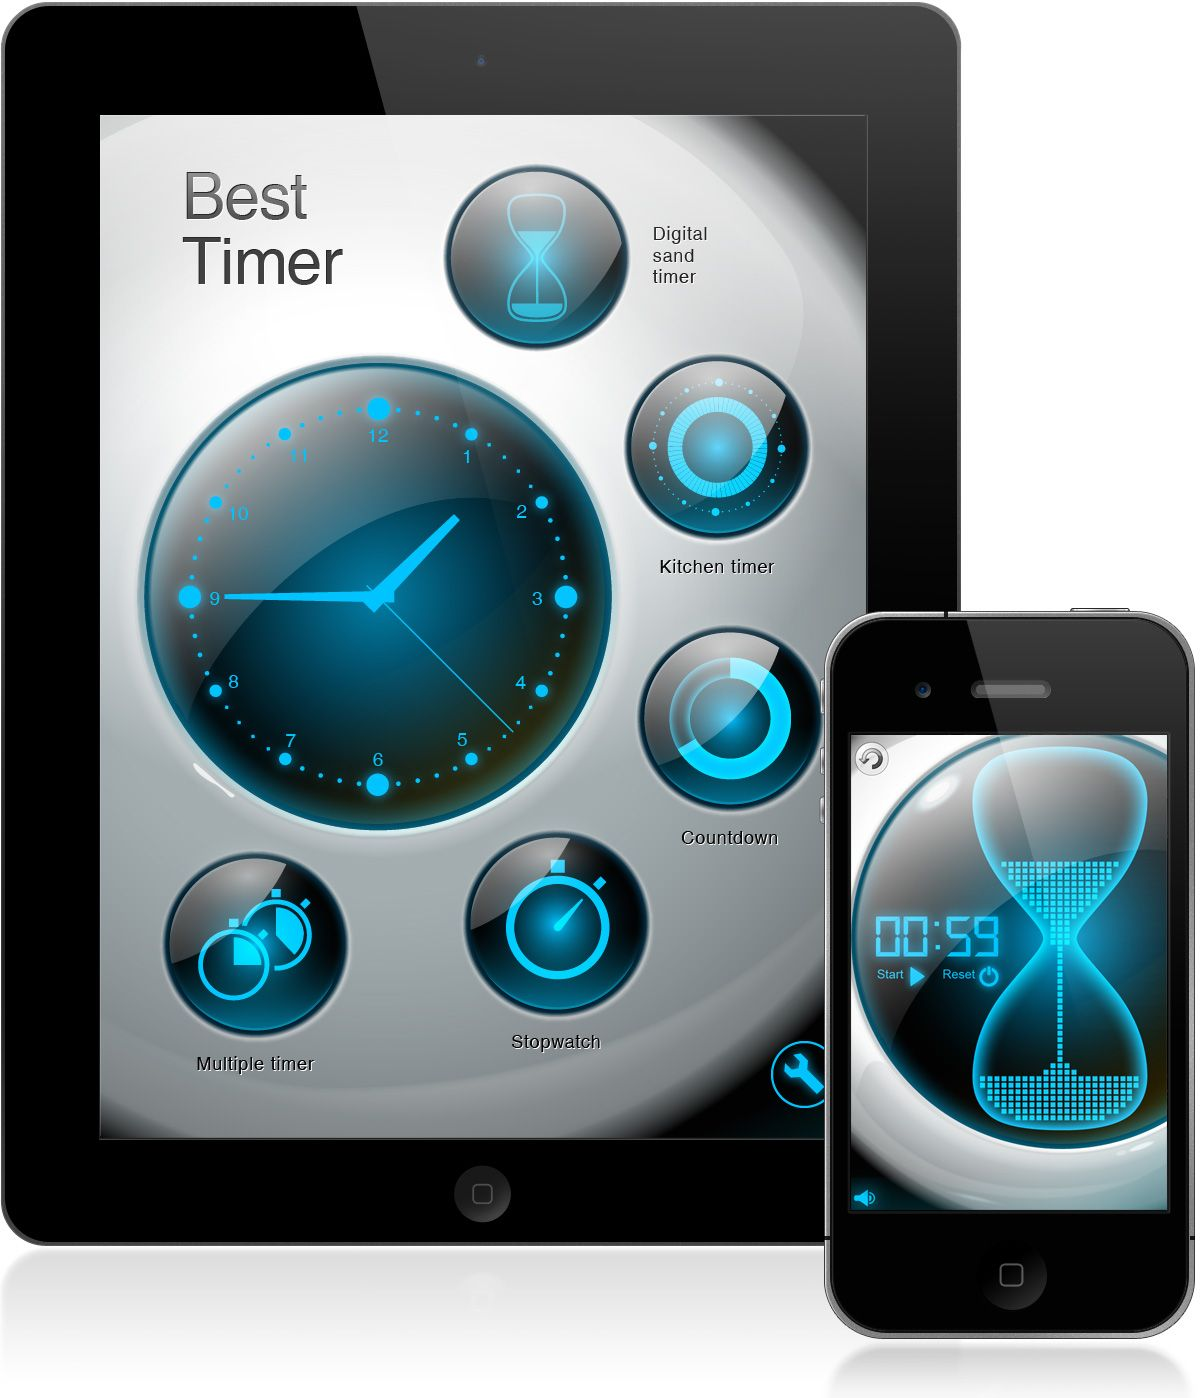 UI design for iPhone/iPad app Best Timer   Watch UI   Pinterest ...